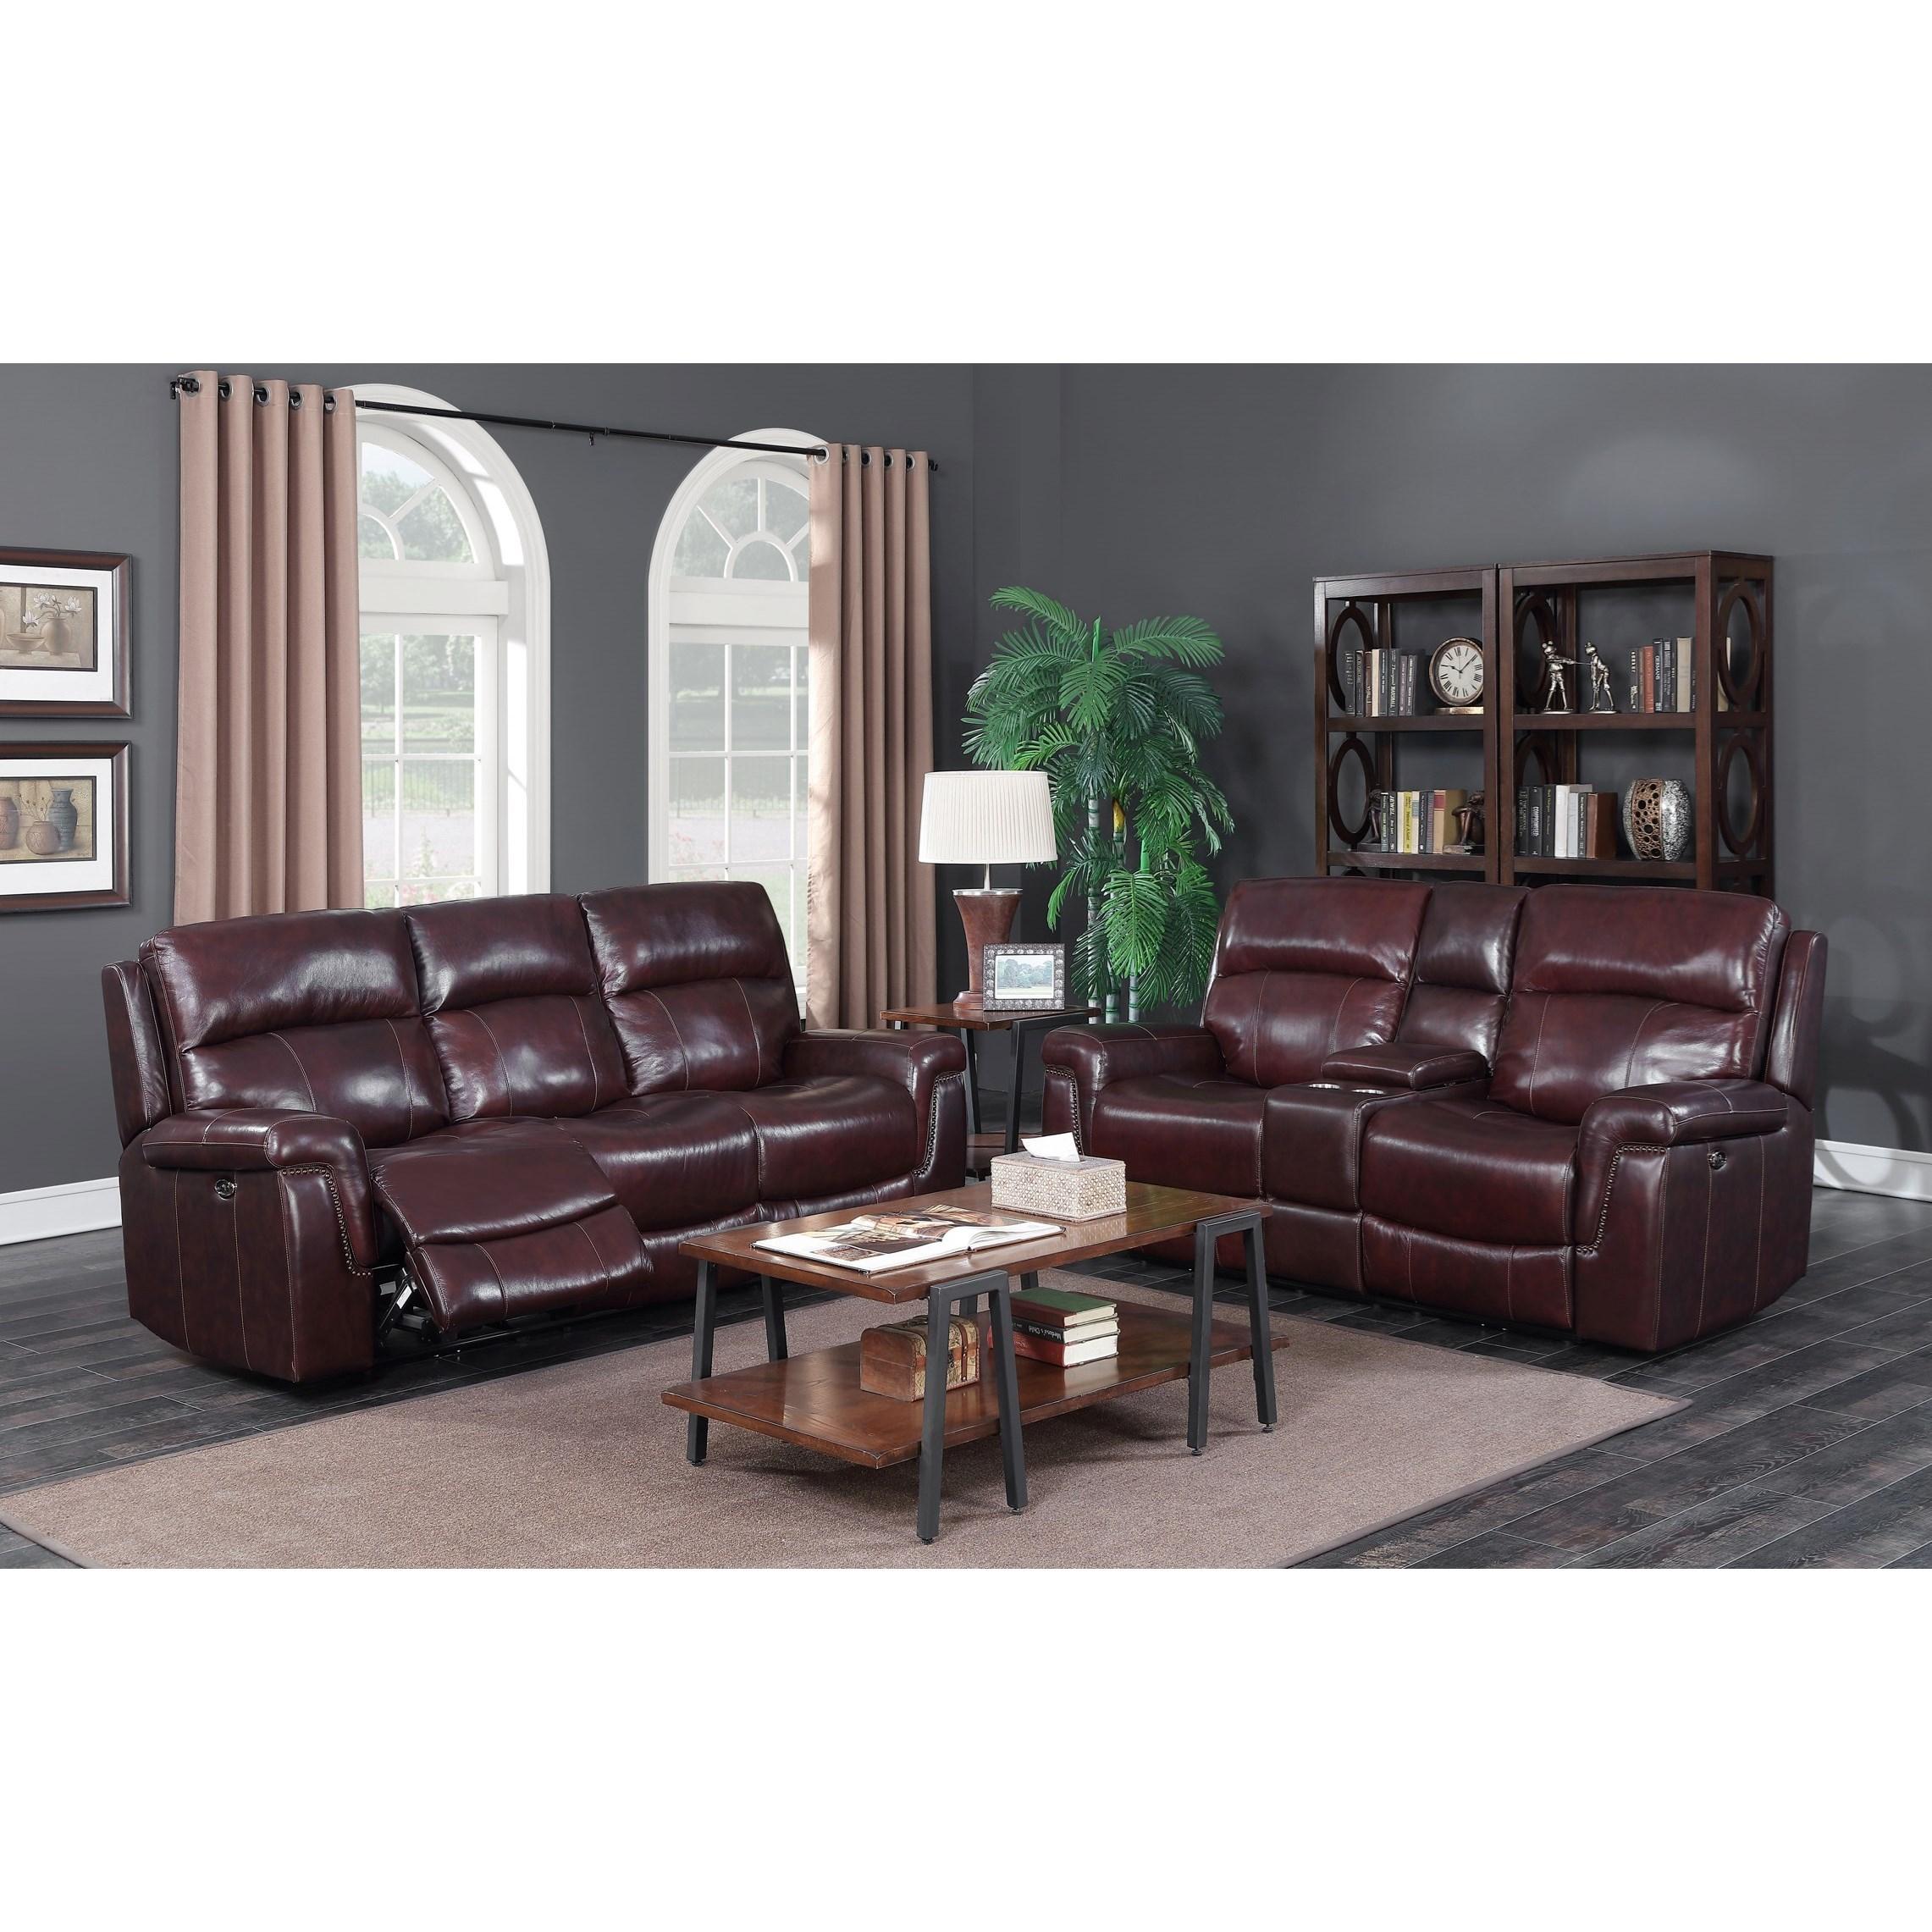 Leather Furniture Company